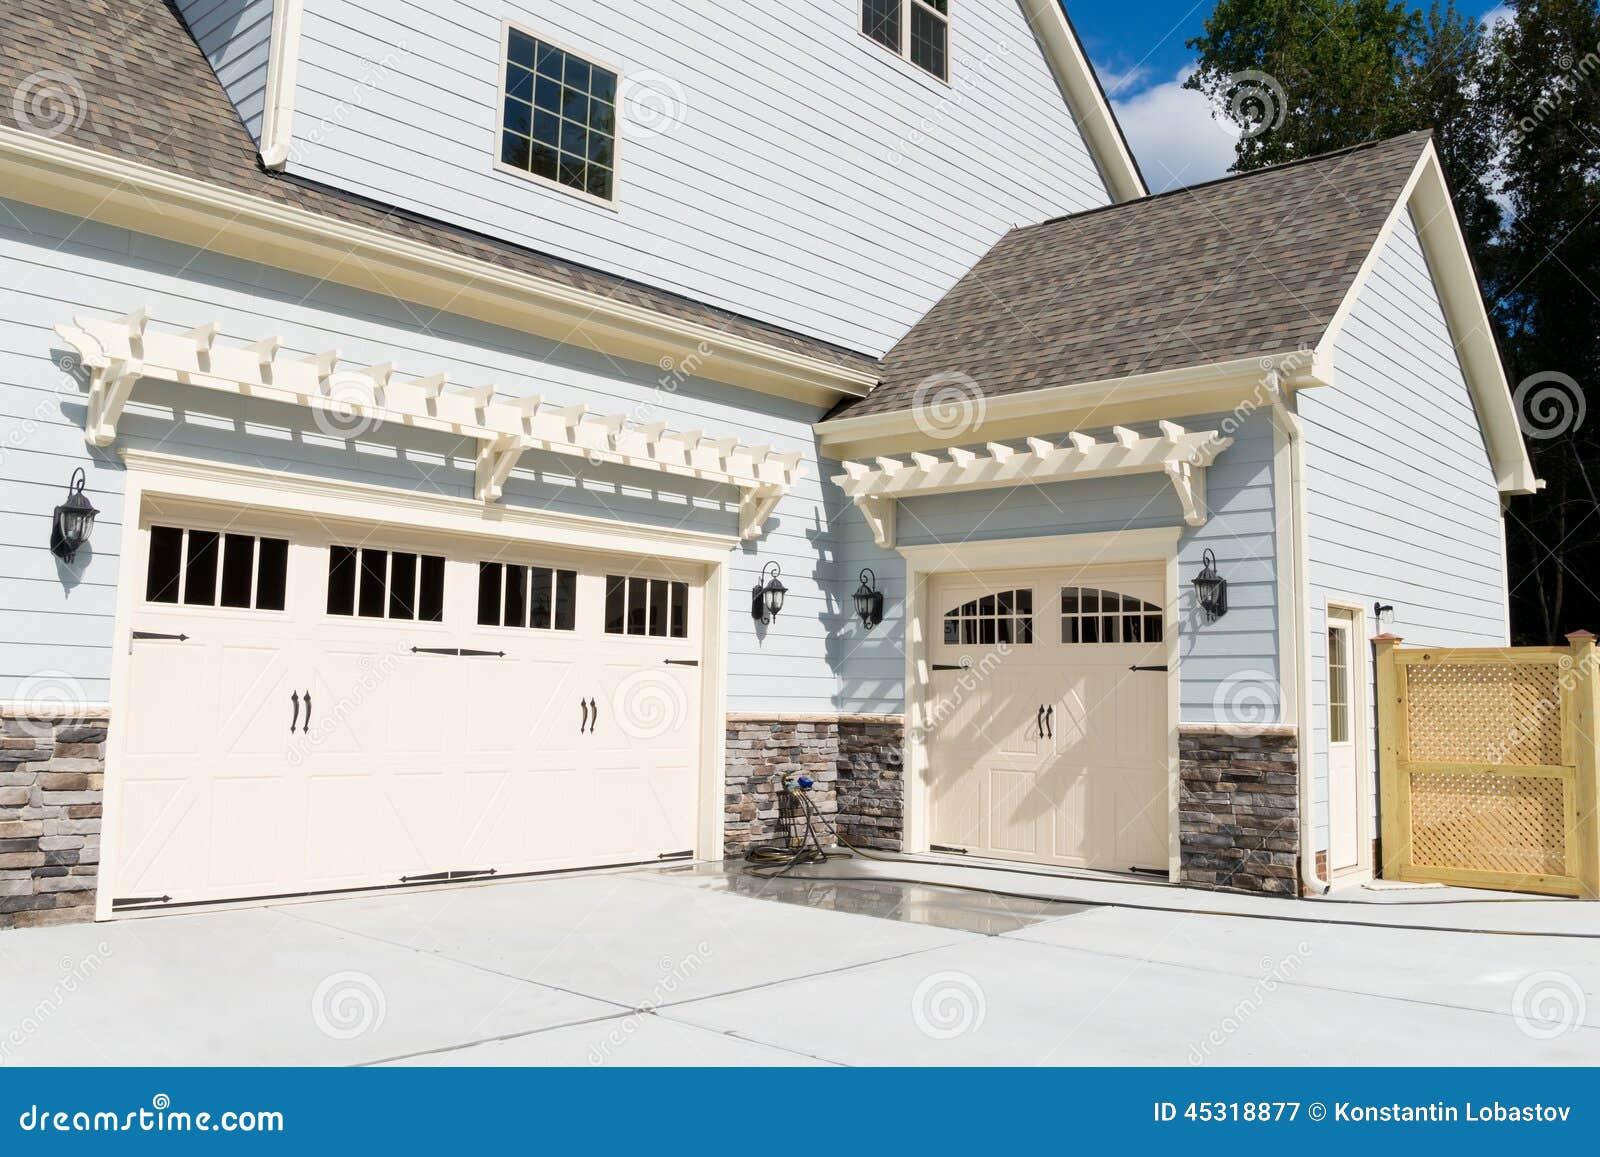 Residential house three car garage doors stock photo for Three door garage